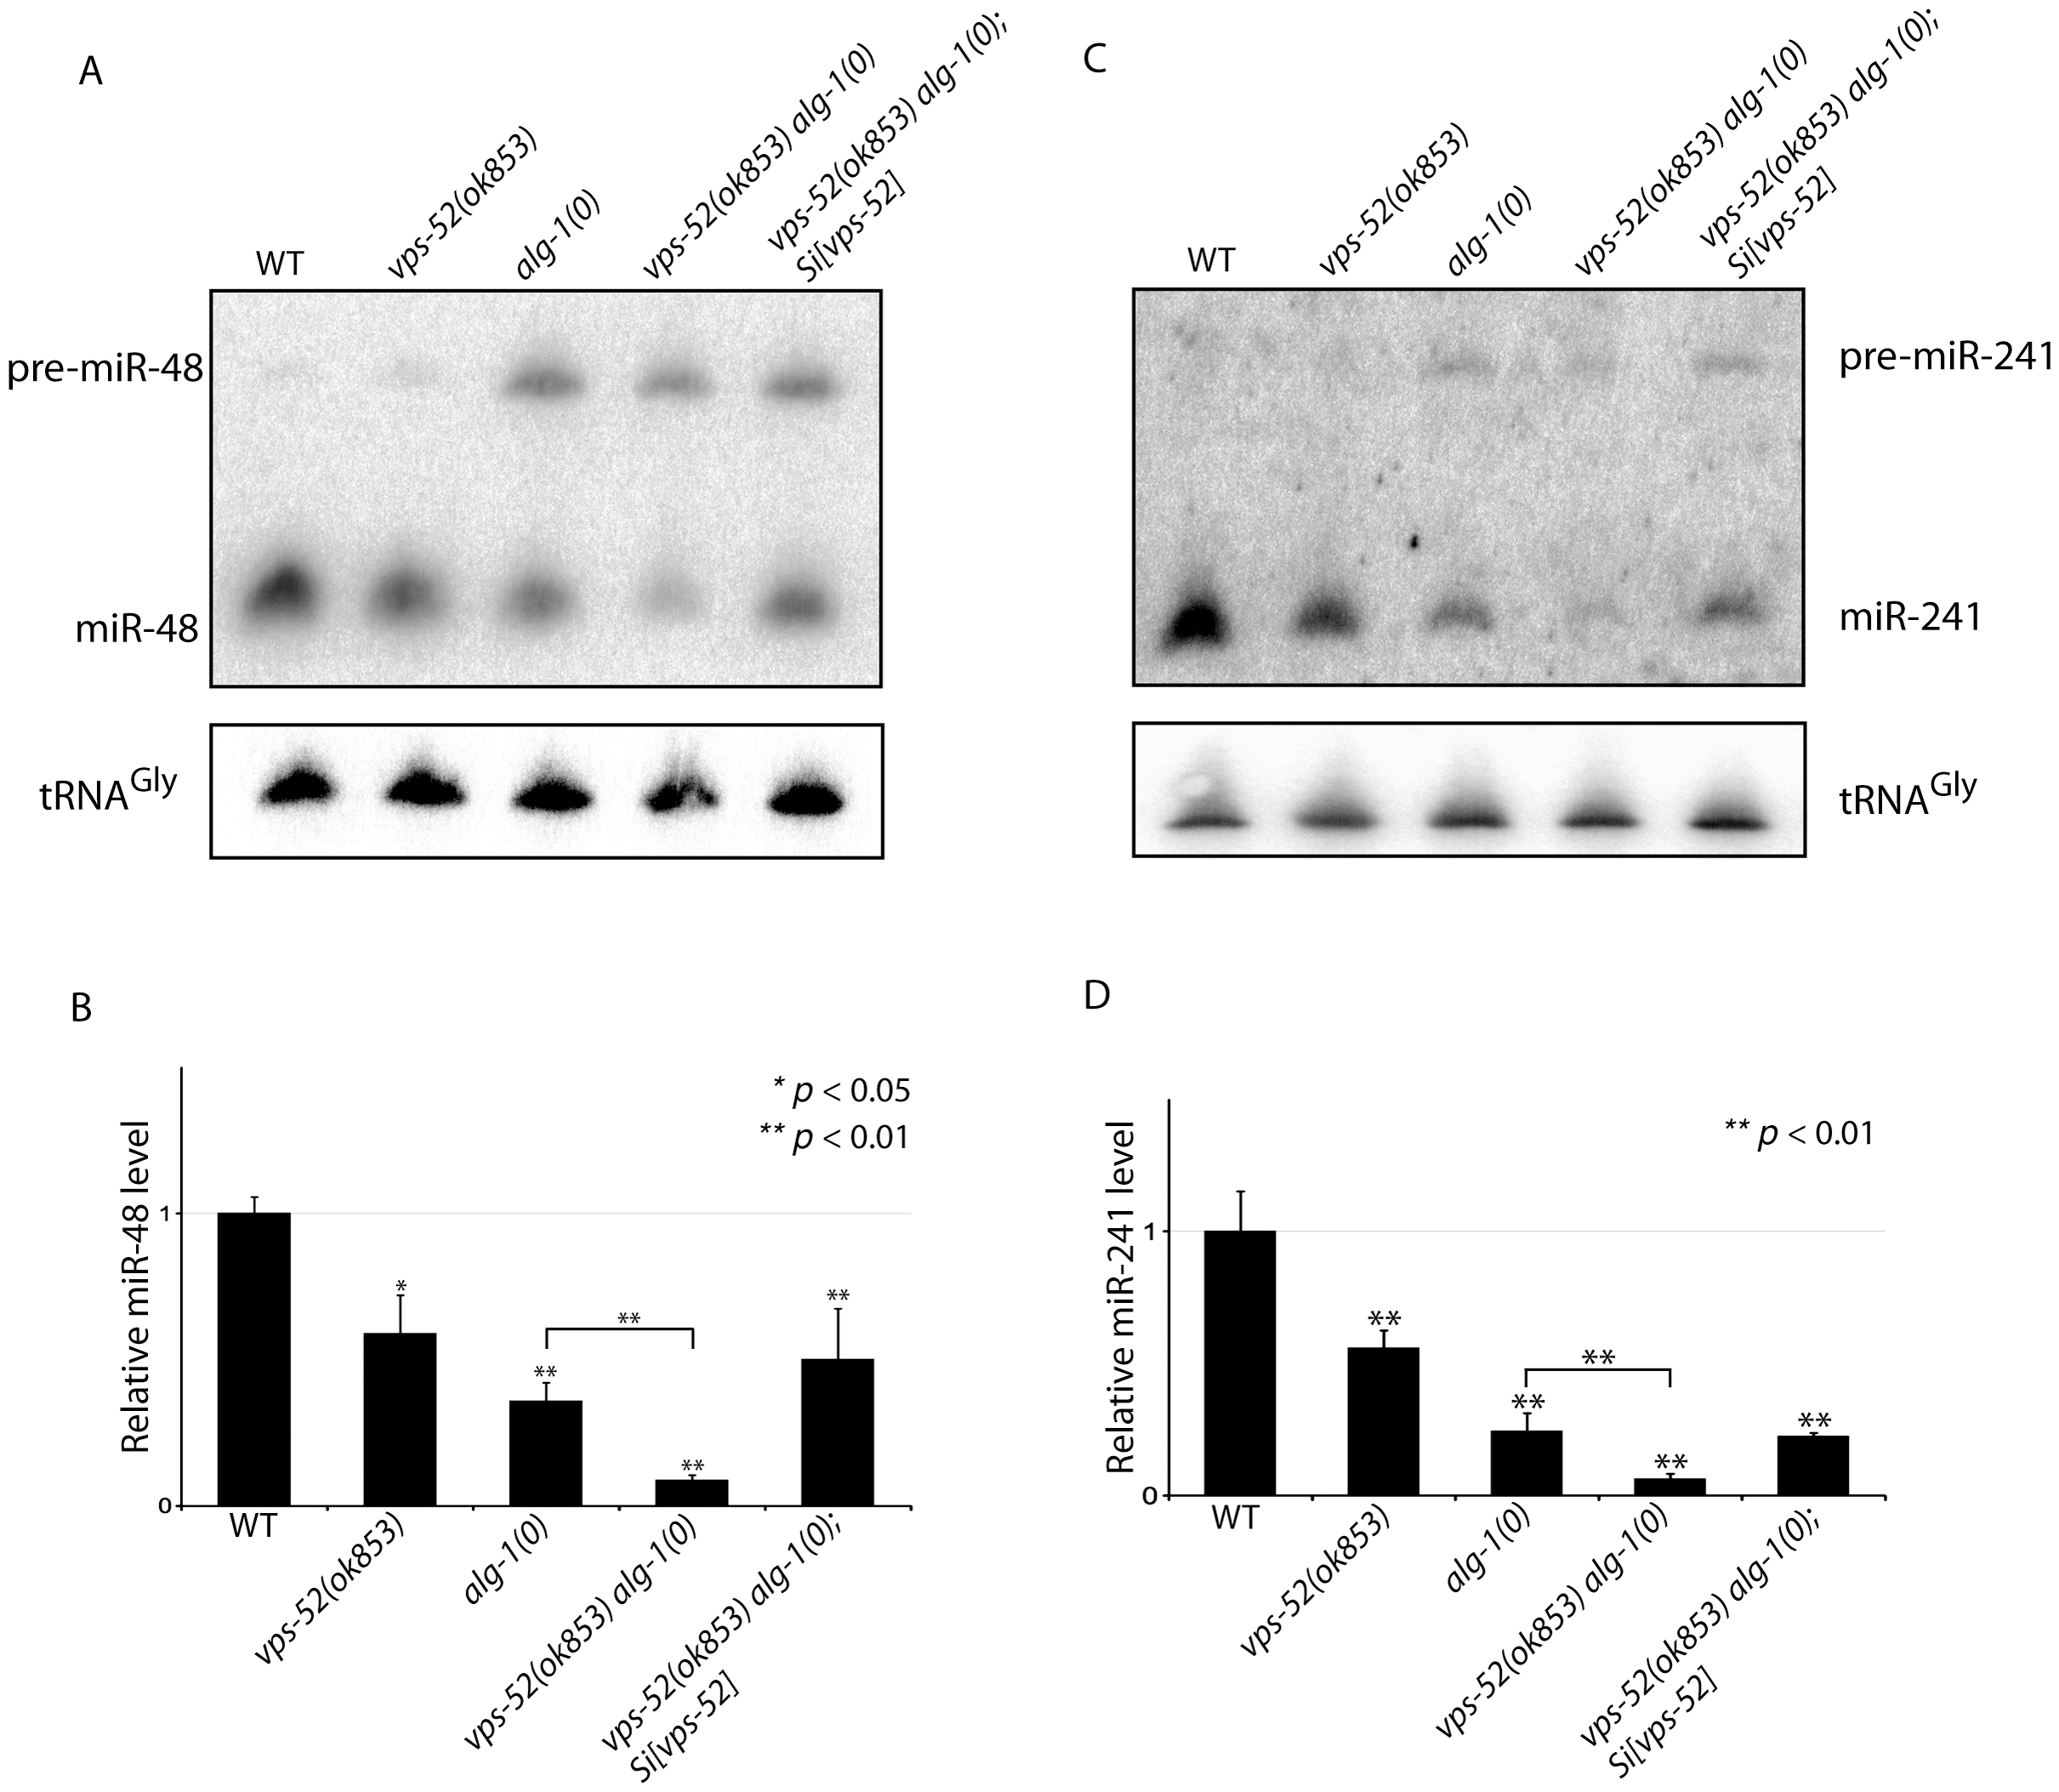 Synergistic effects of <i>vps-52</i> on the abundance of mature <i>let-7</i> family miRNAs.